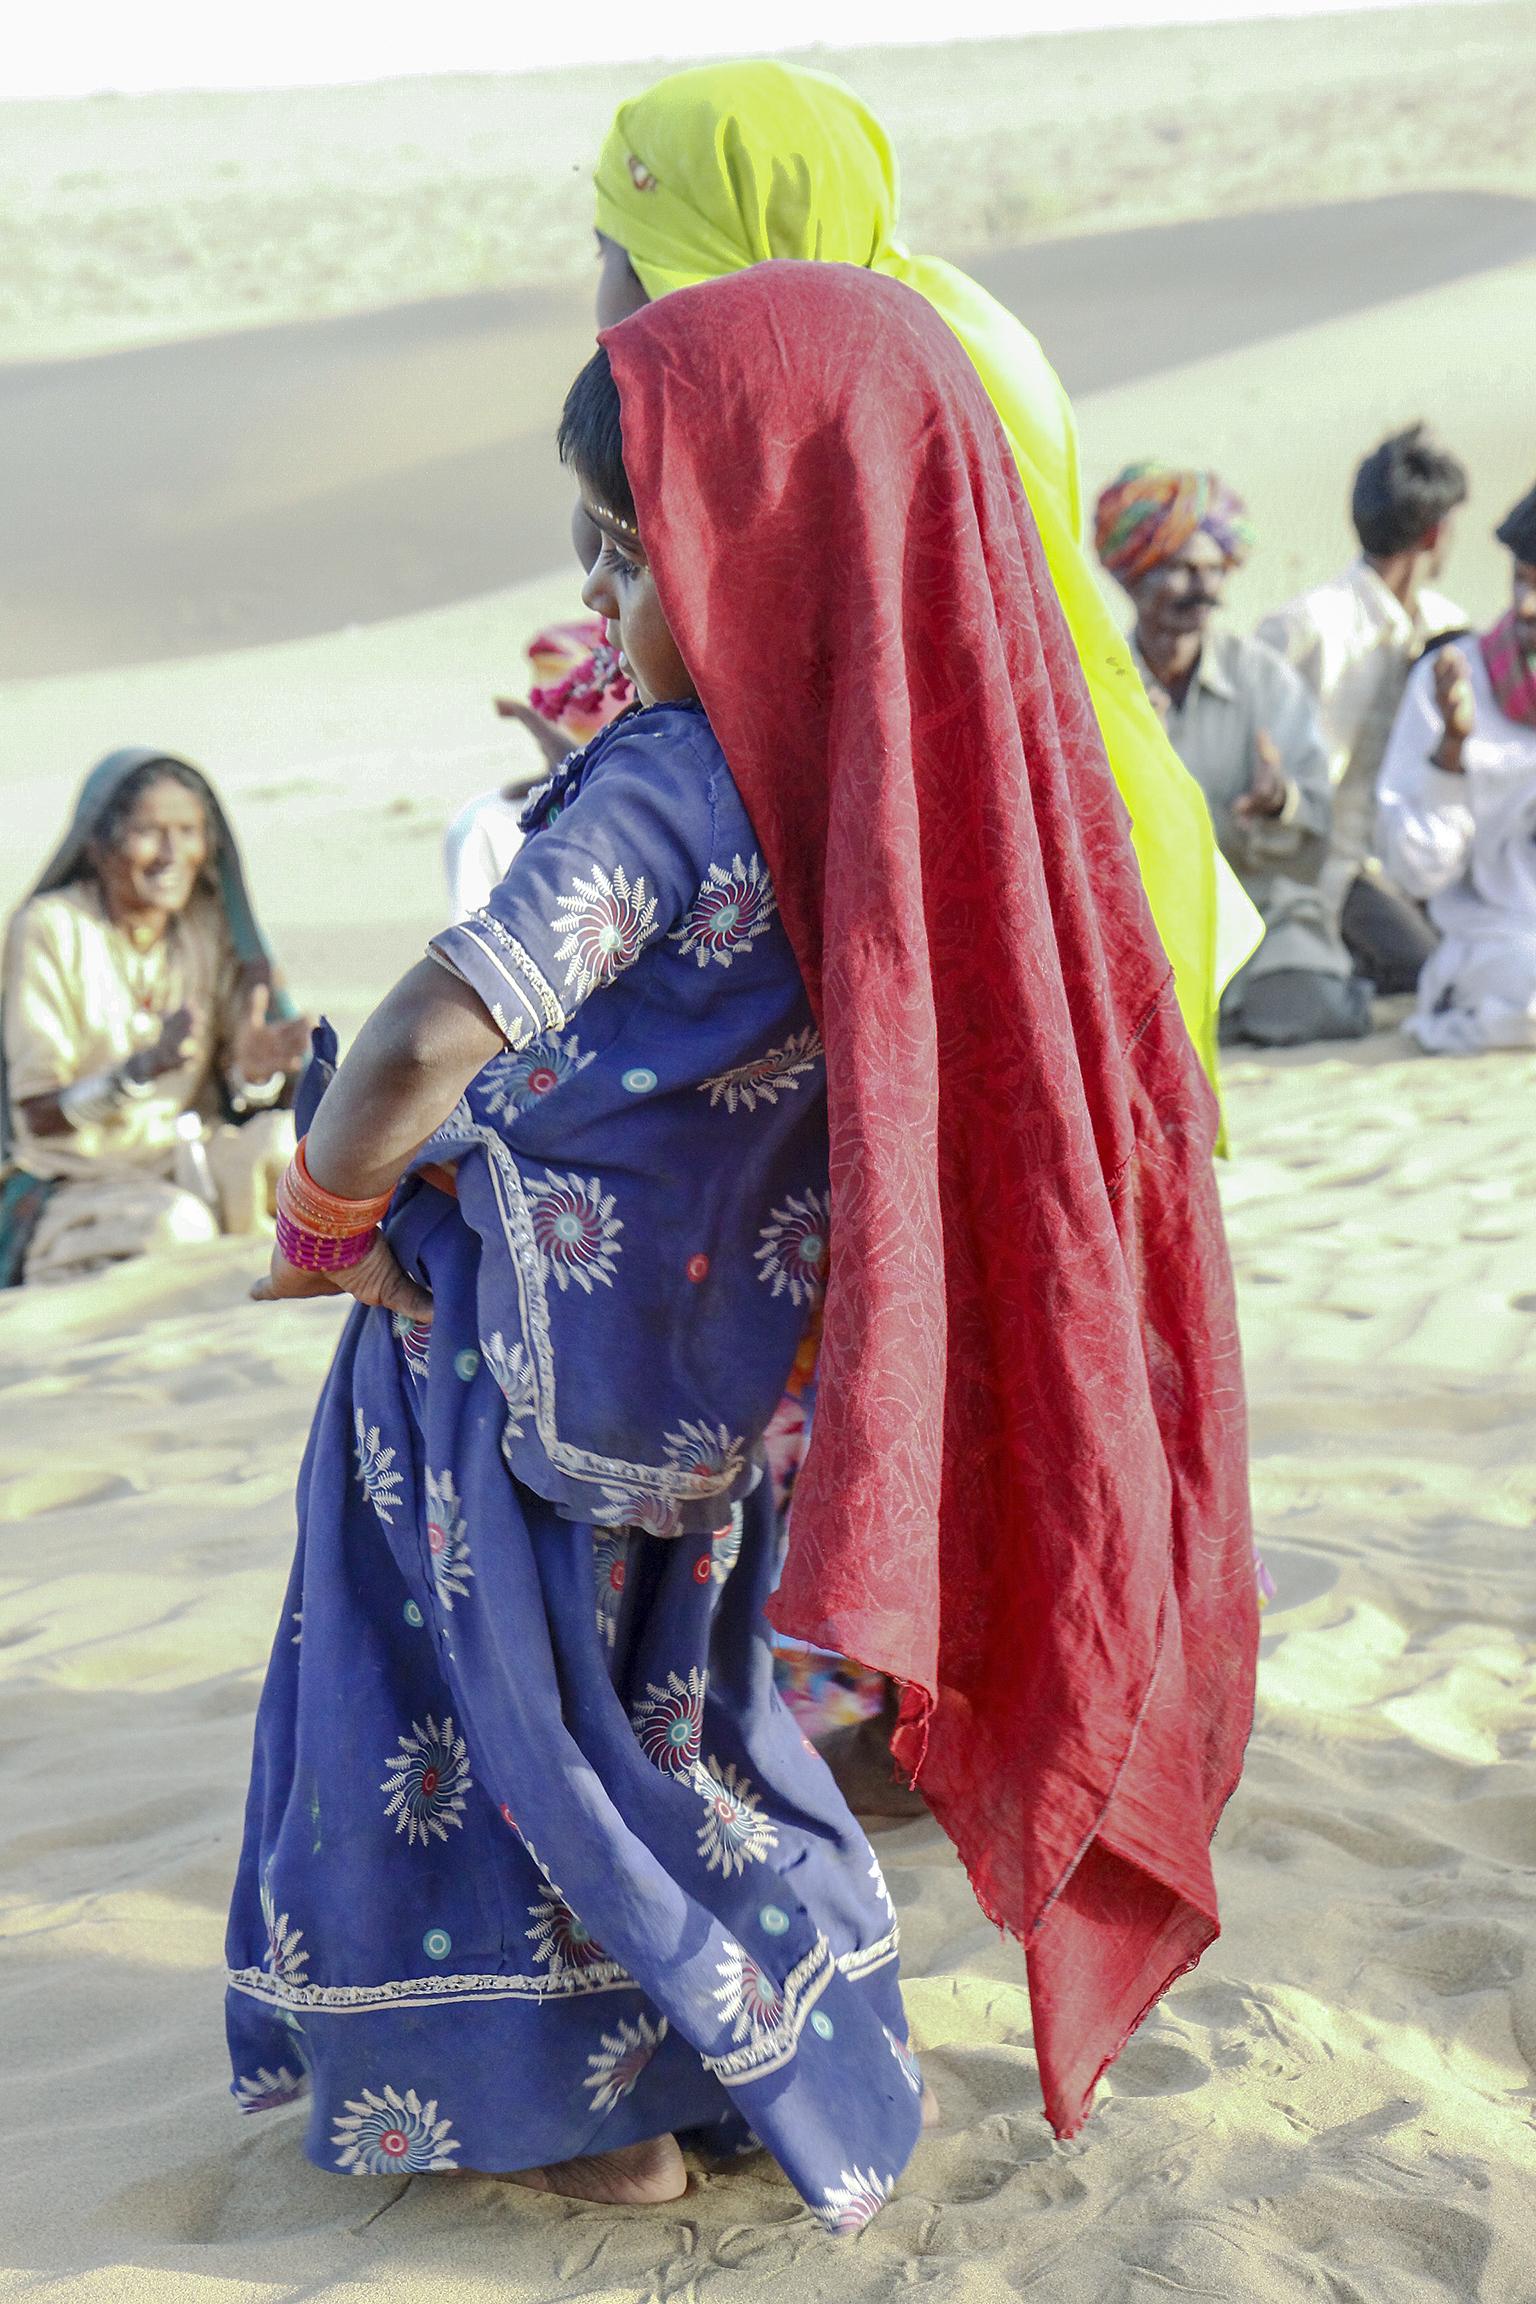 portraits-indien-inde-rajasthan-2010-marie-colette-becker-26